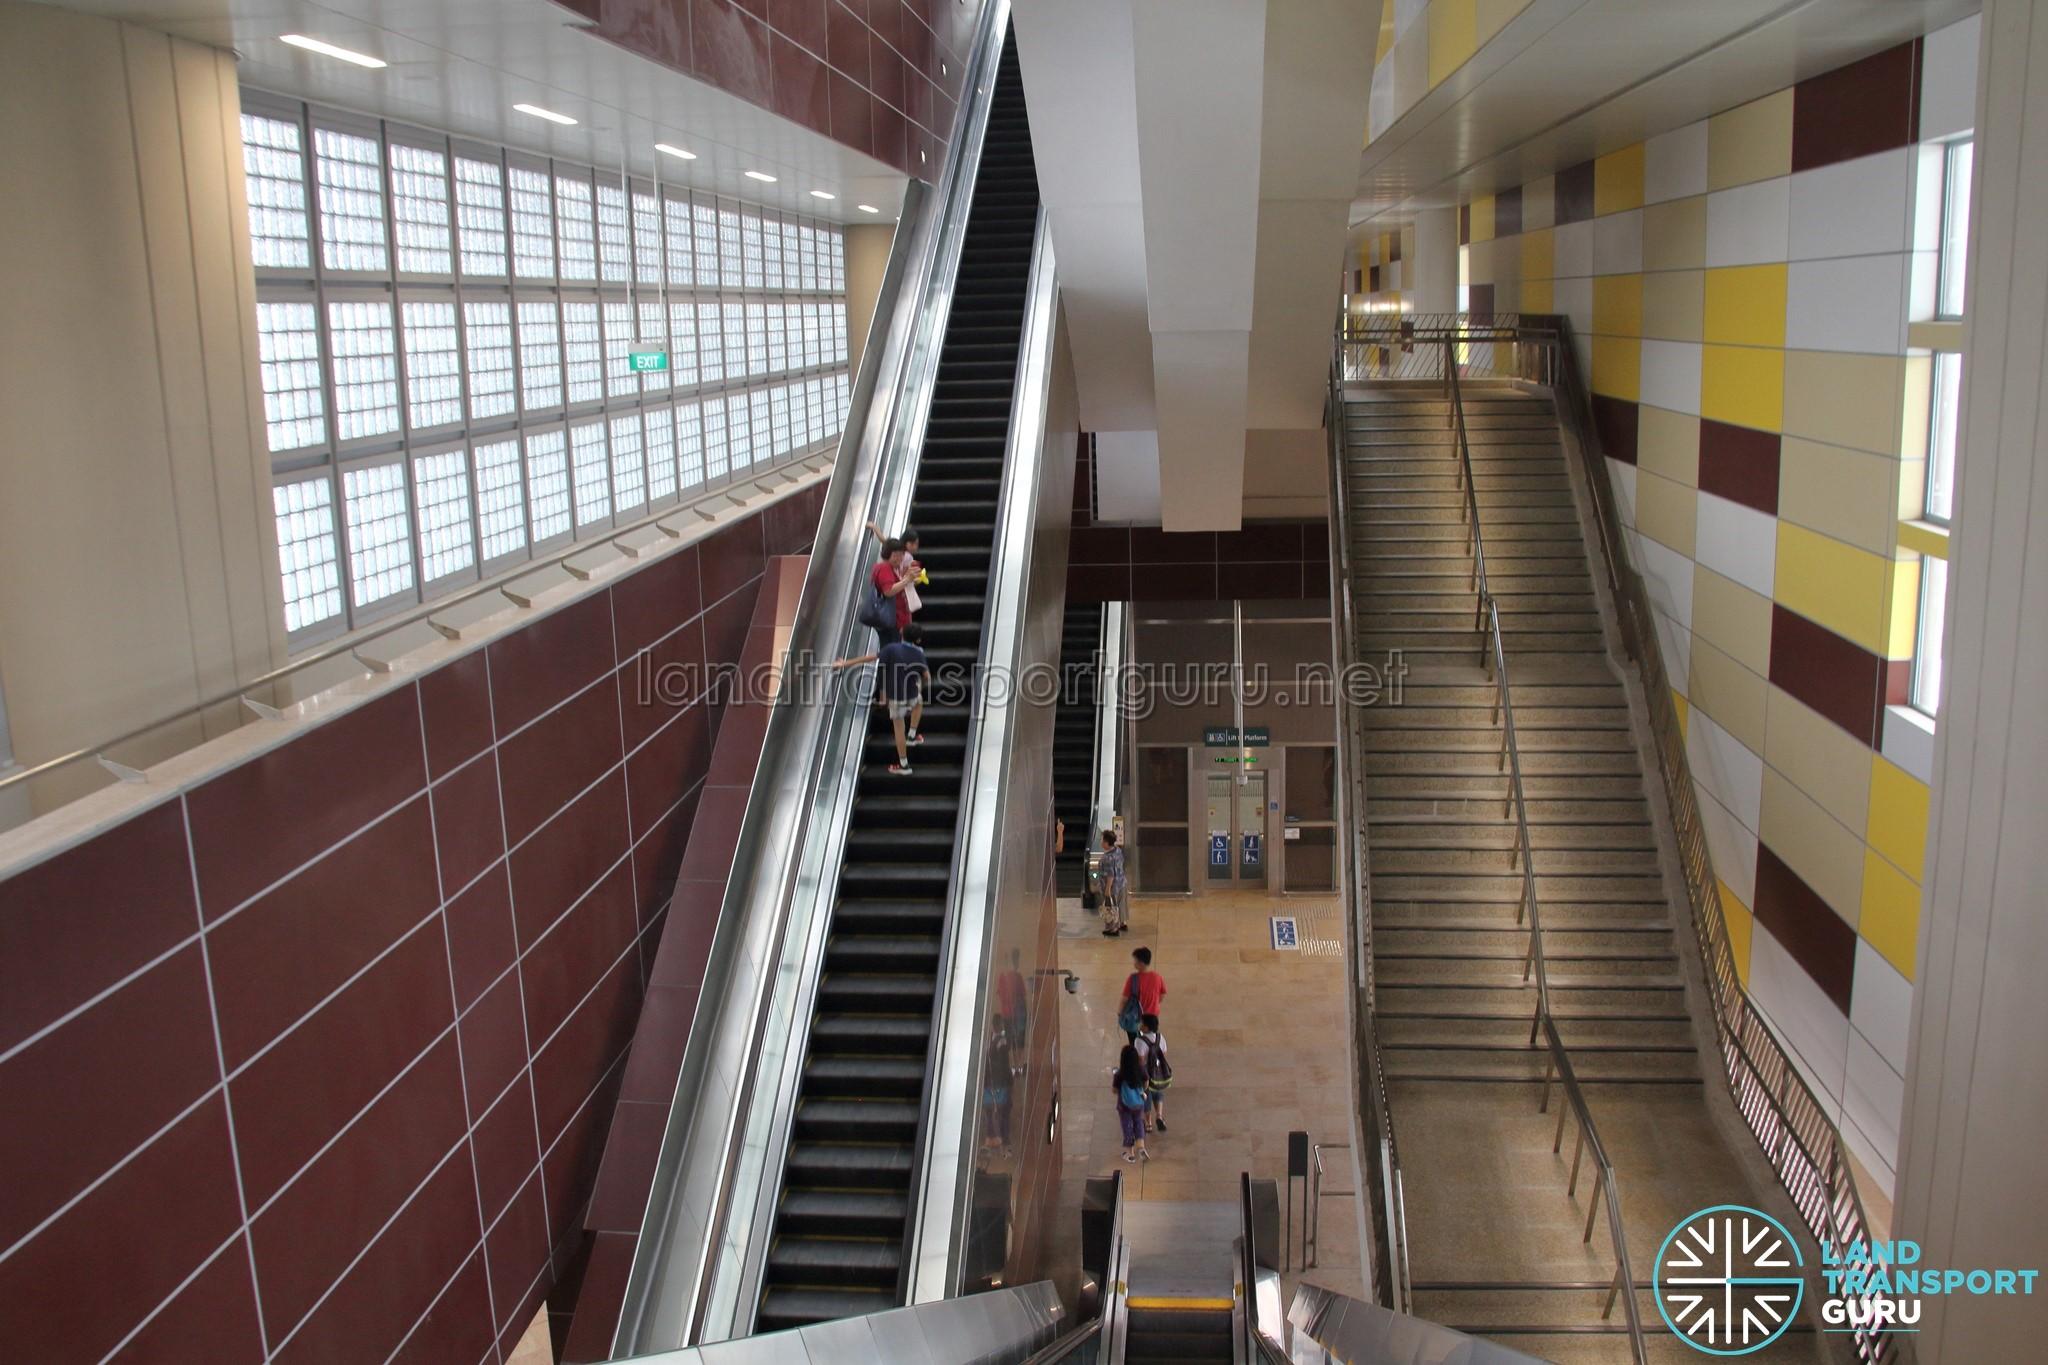 Tuas West Road MRT Station - Escalators